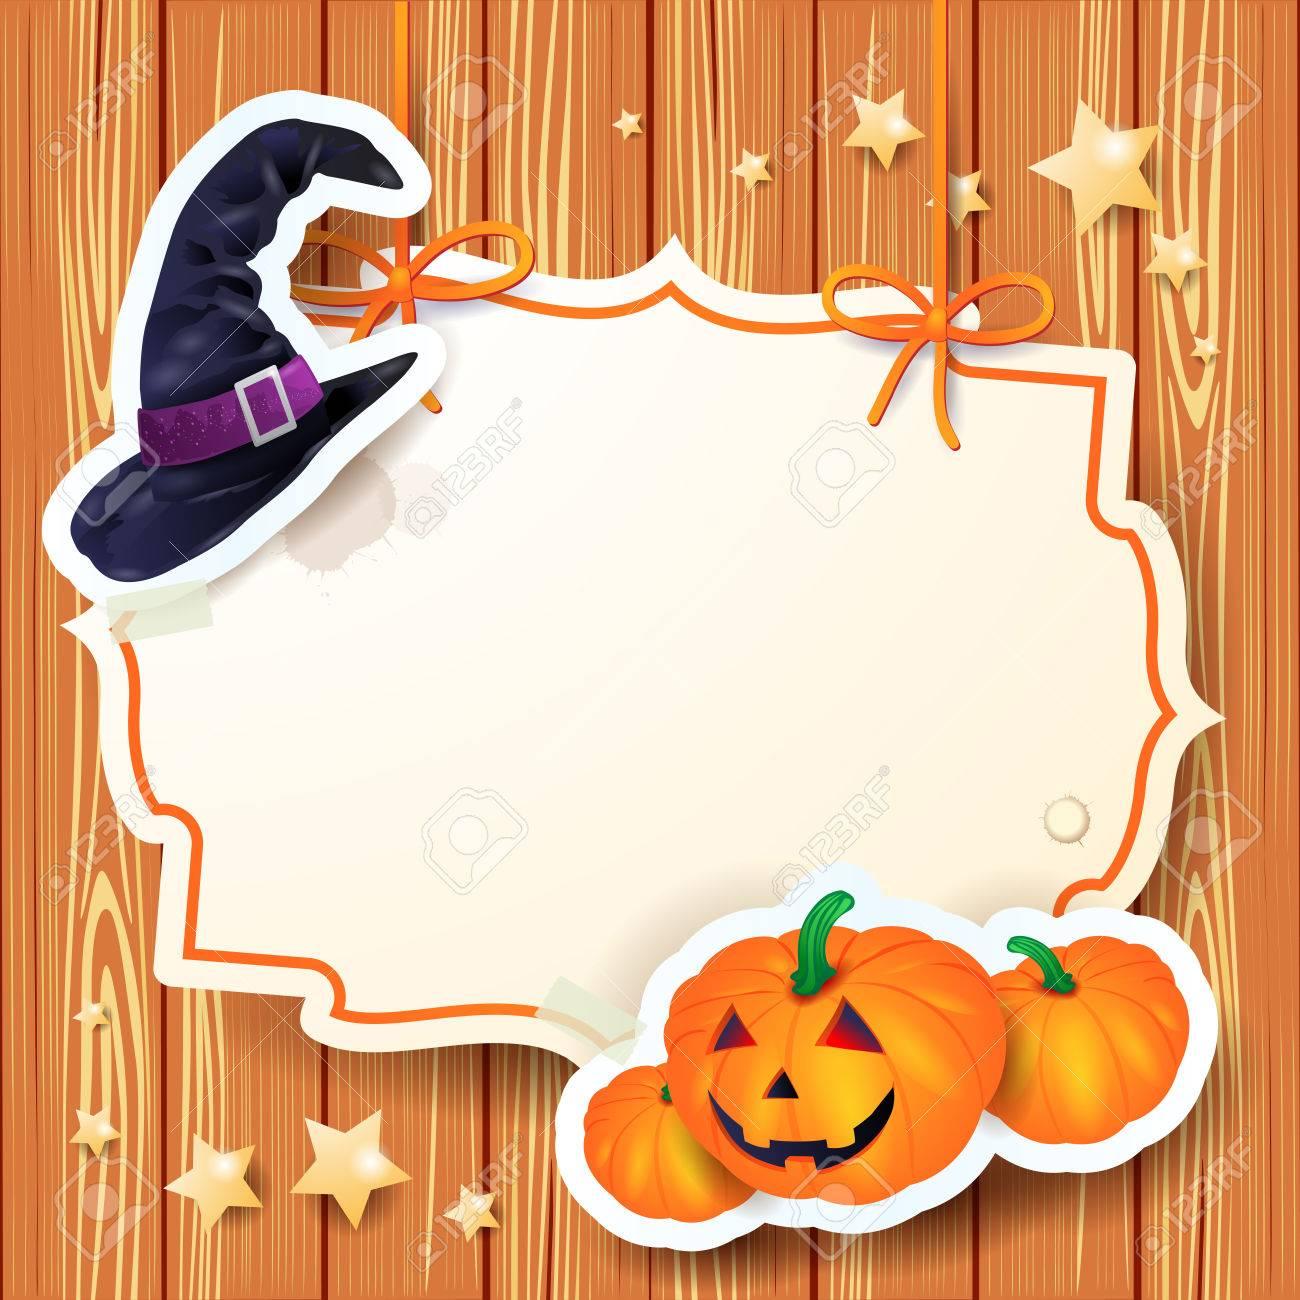 Halloween background with label, vector eps10 Stock Vector - 23026615